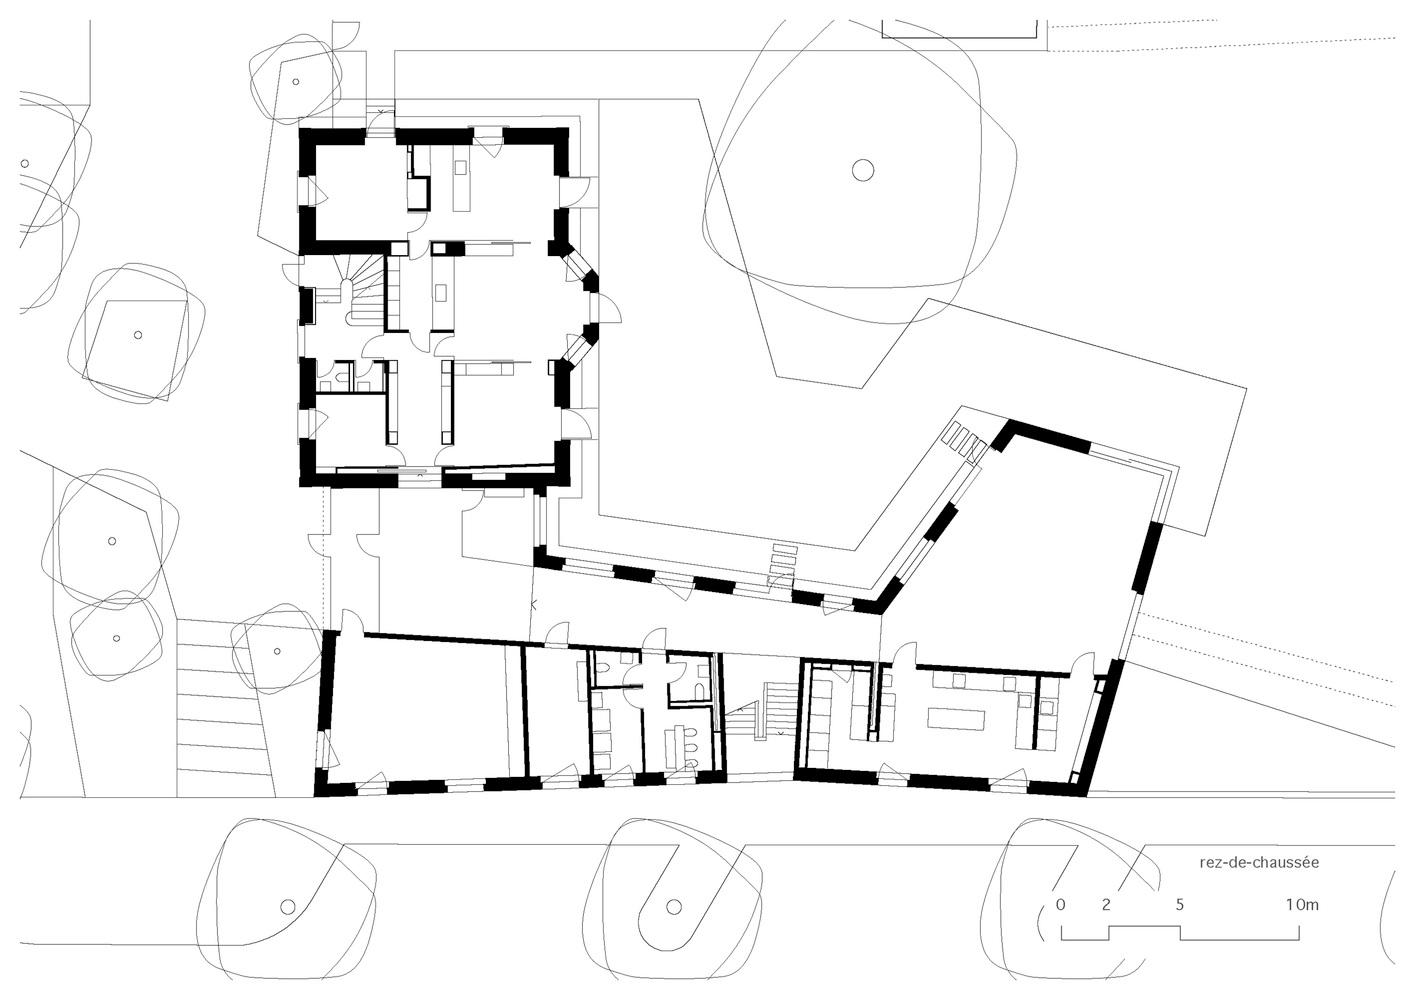 Le Gazouillis Day Nursery Refurbishment,Ground Floor Plan